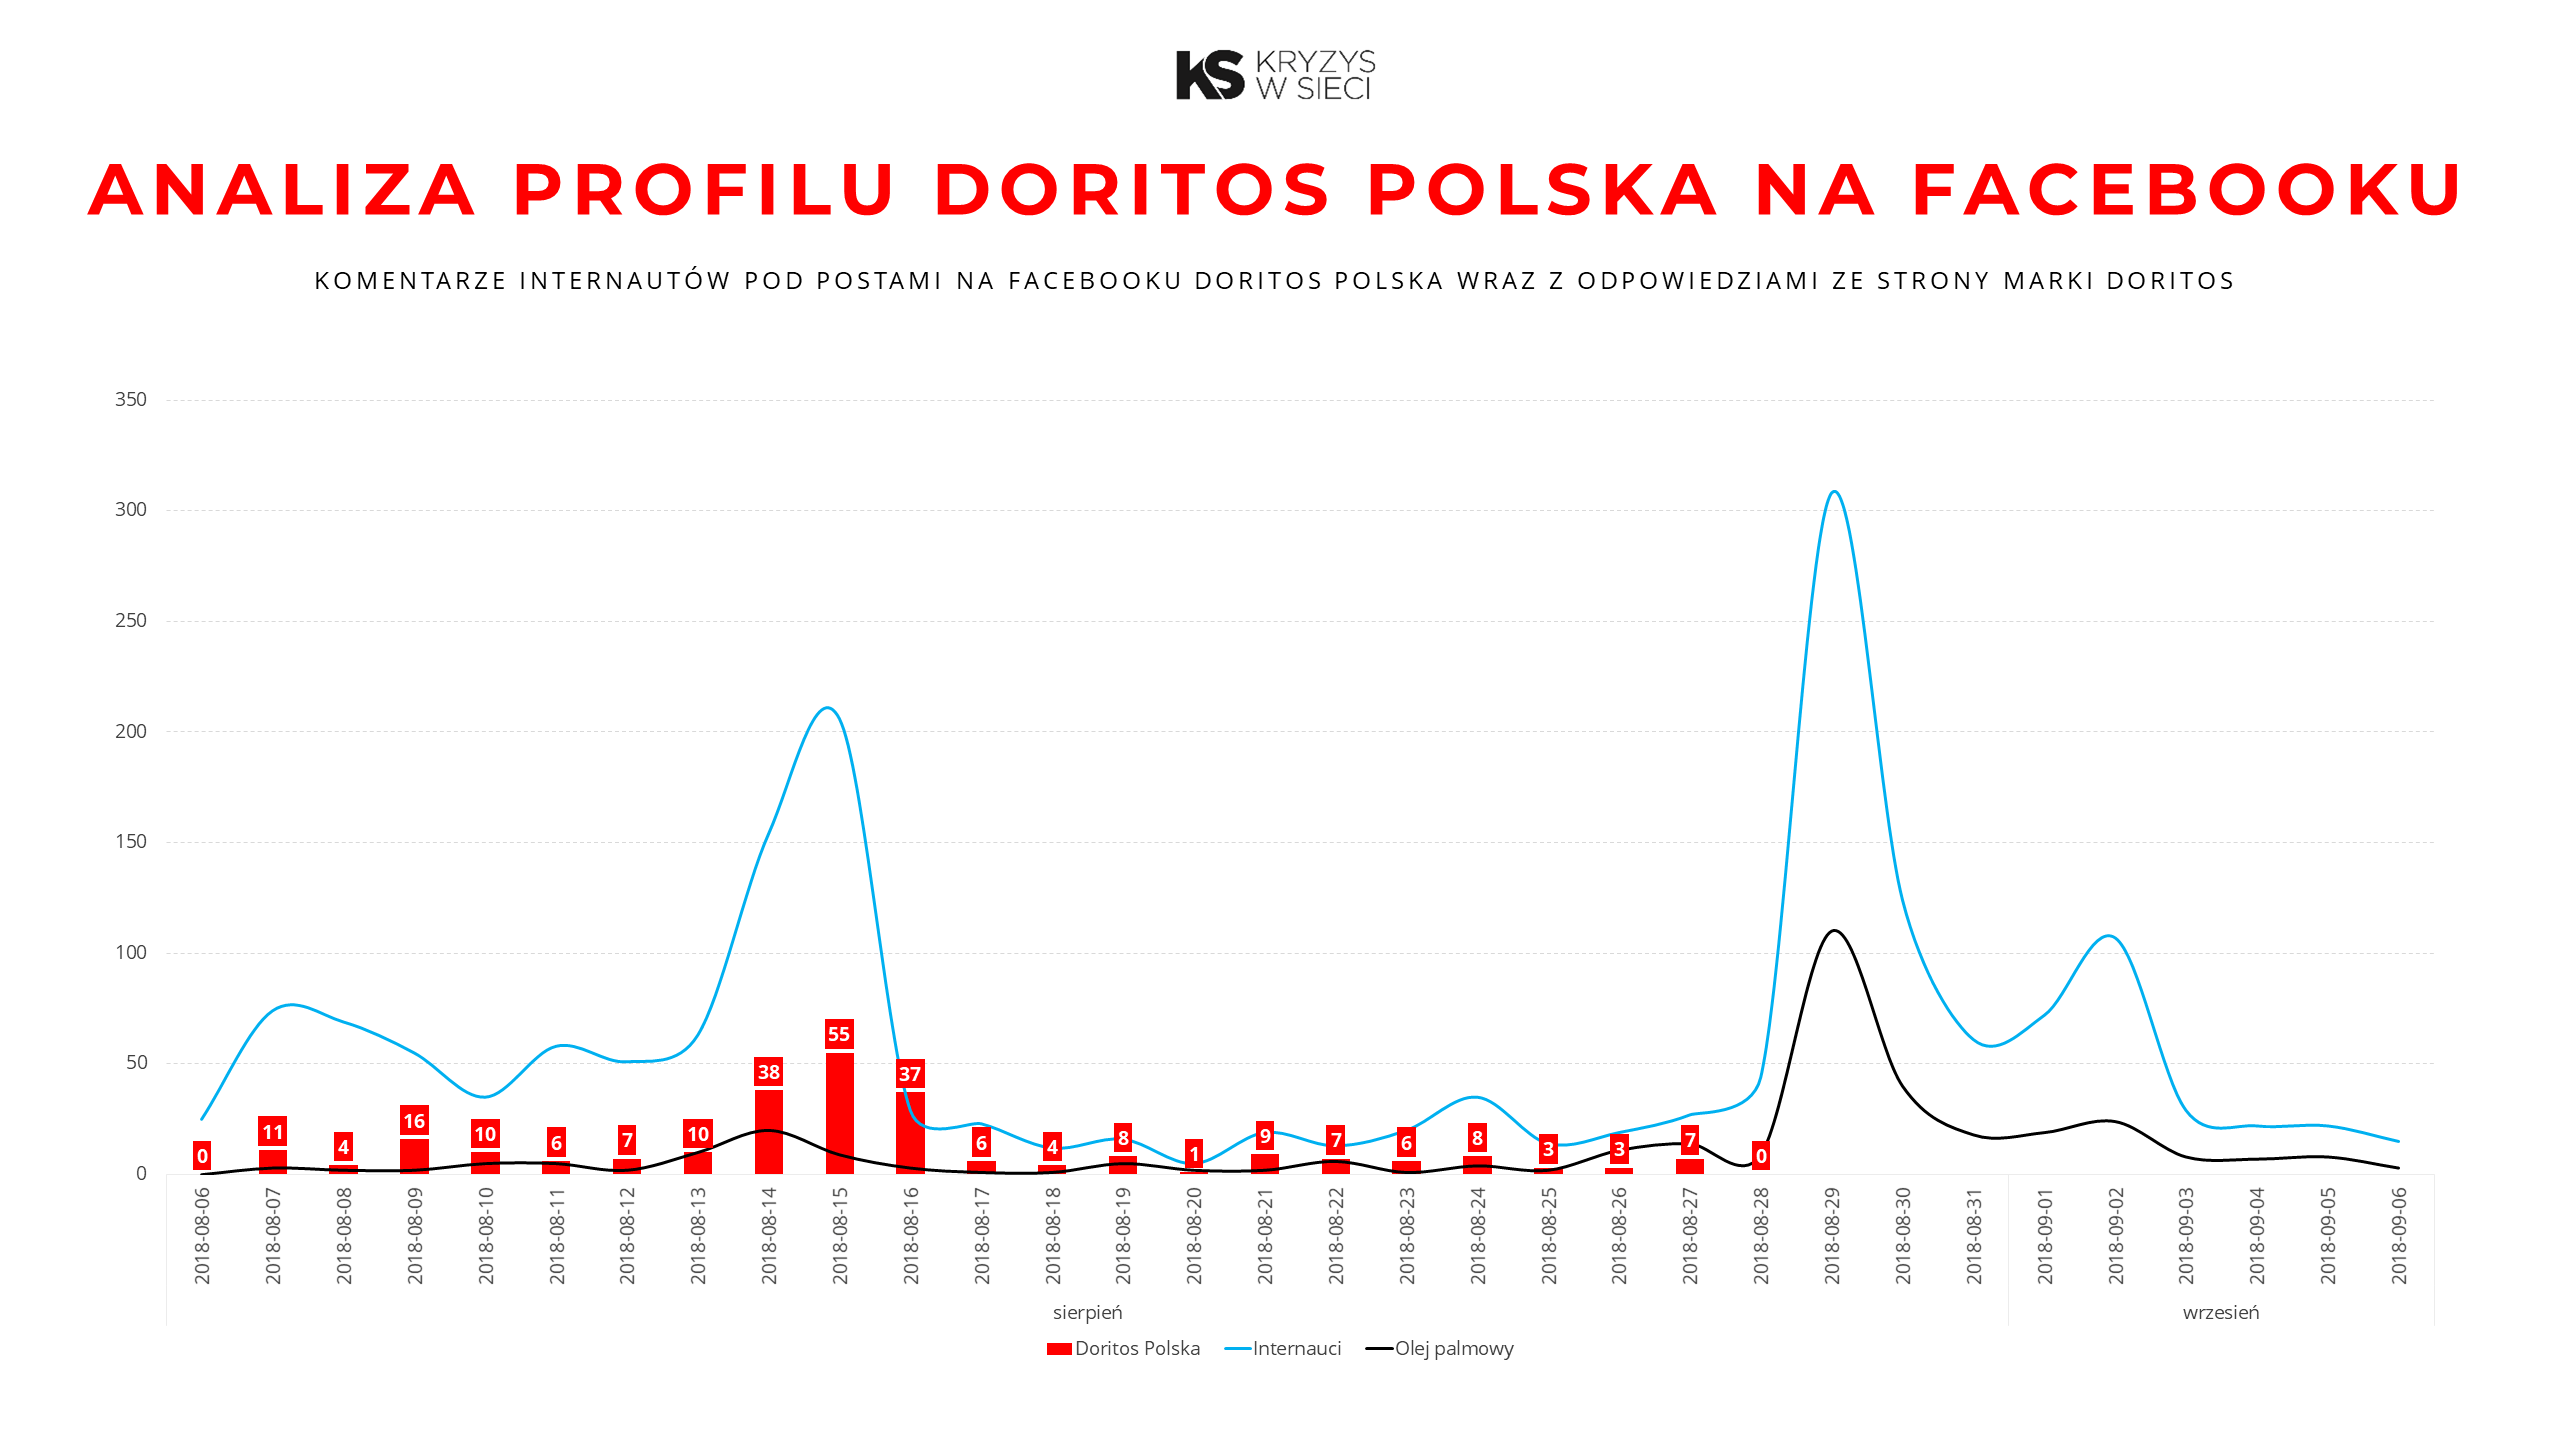 doritos polska